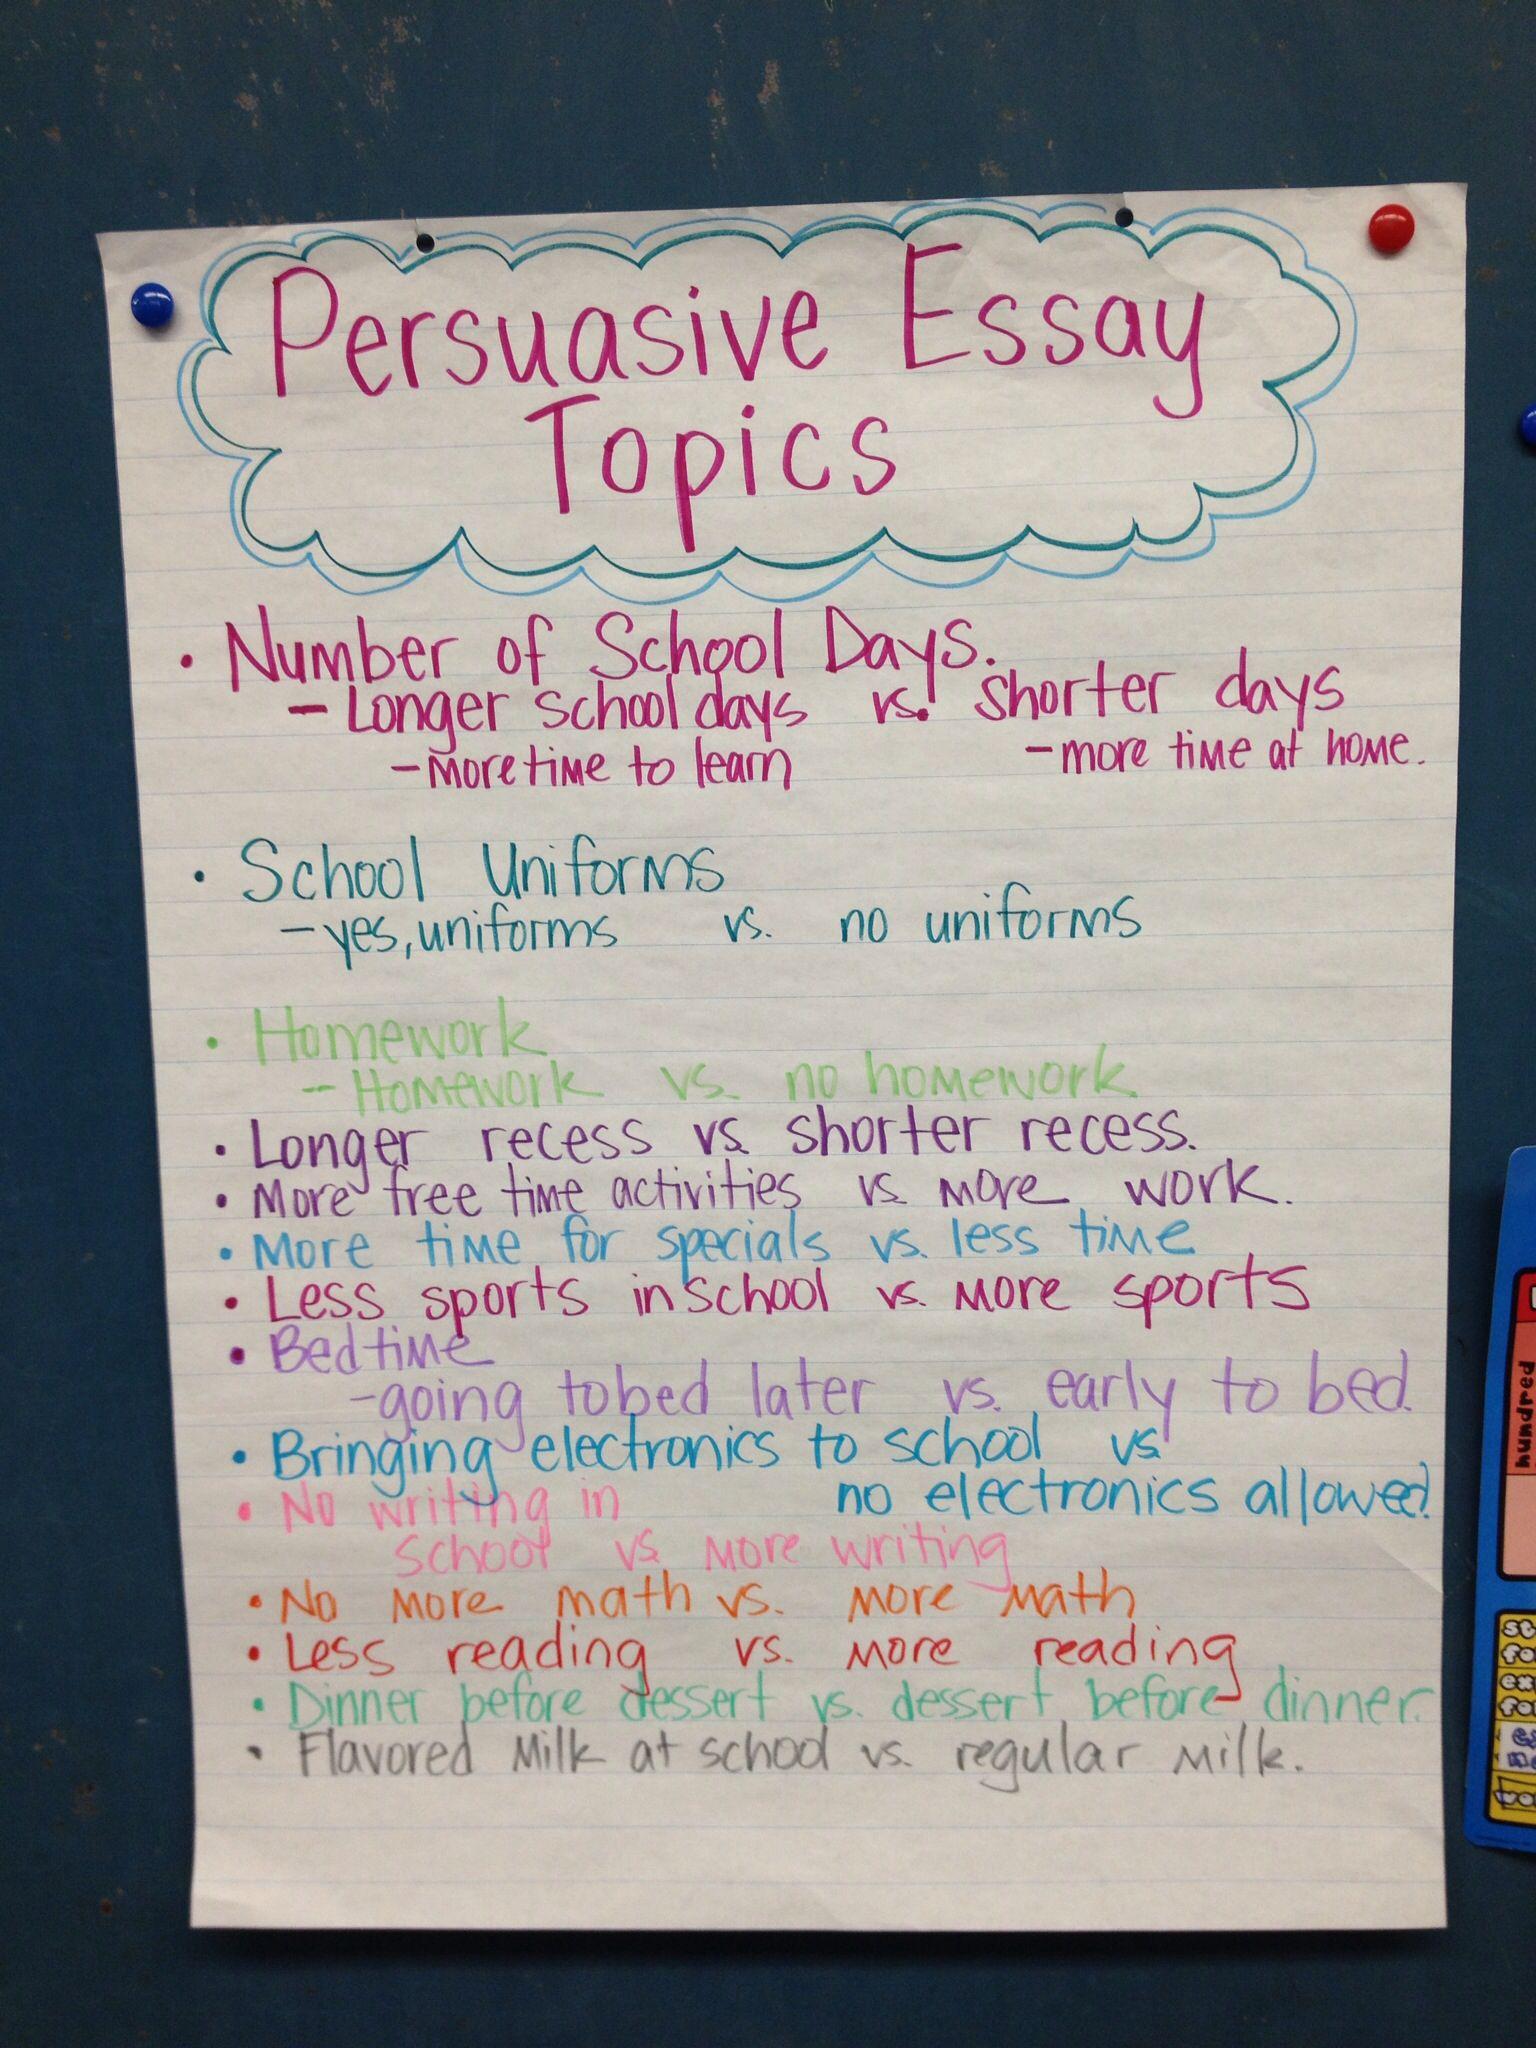 013 Good Persuasive Essay Topics Example Amazing 2018 Uk Argumentative High School Full